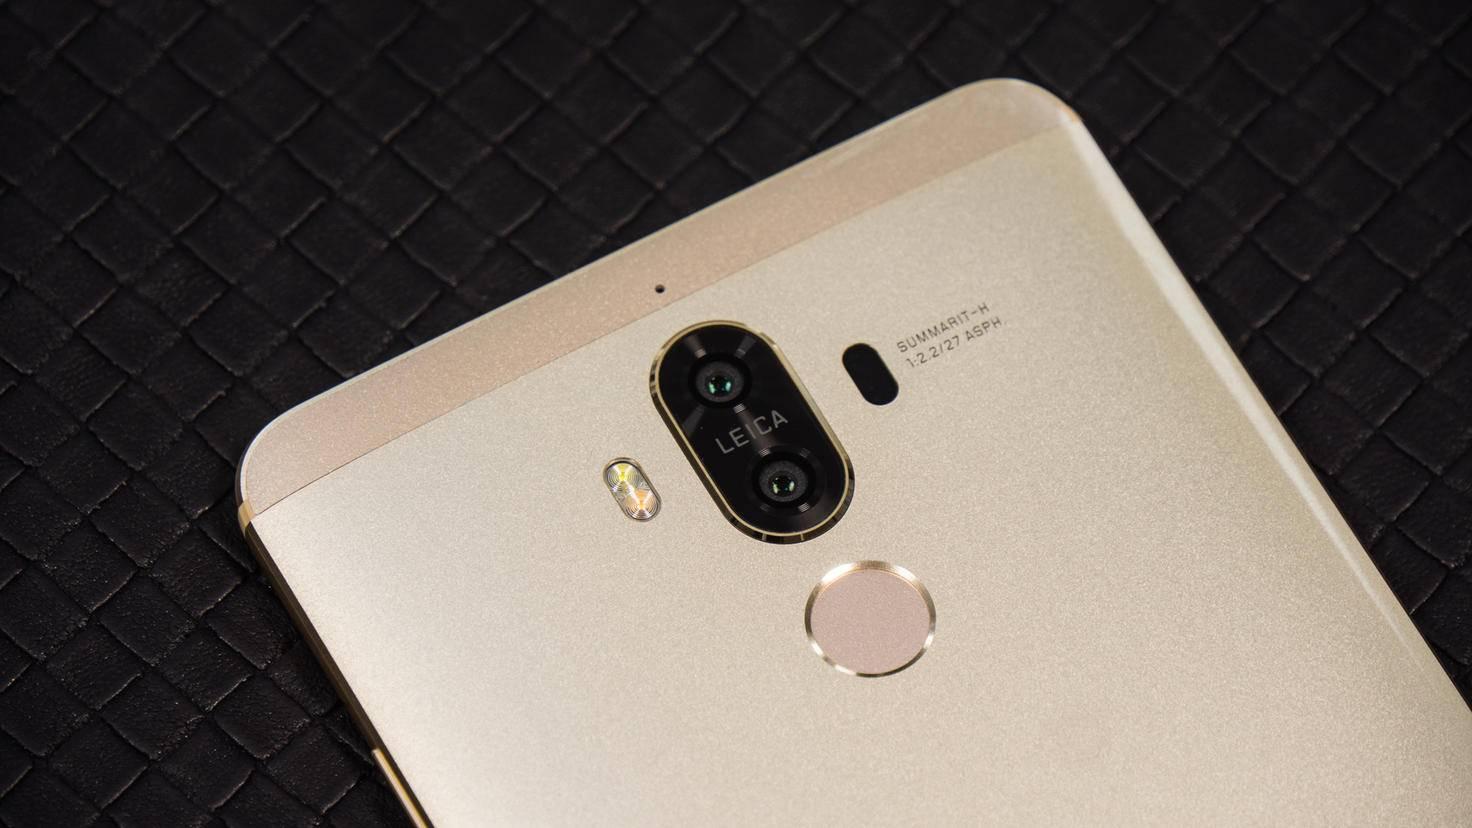 Fixe Kamera, starke Performance & ein Monster-Akku: Das Huawei Mate 9...